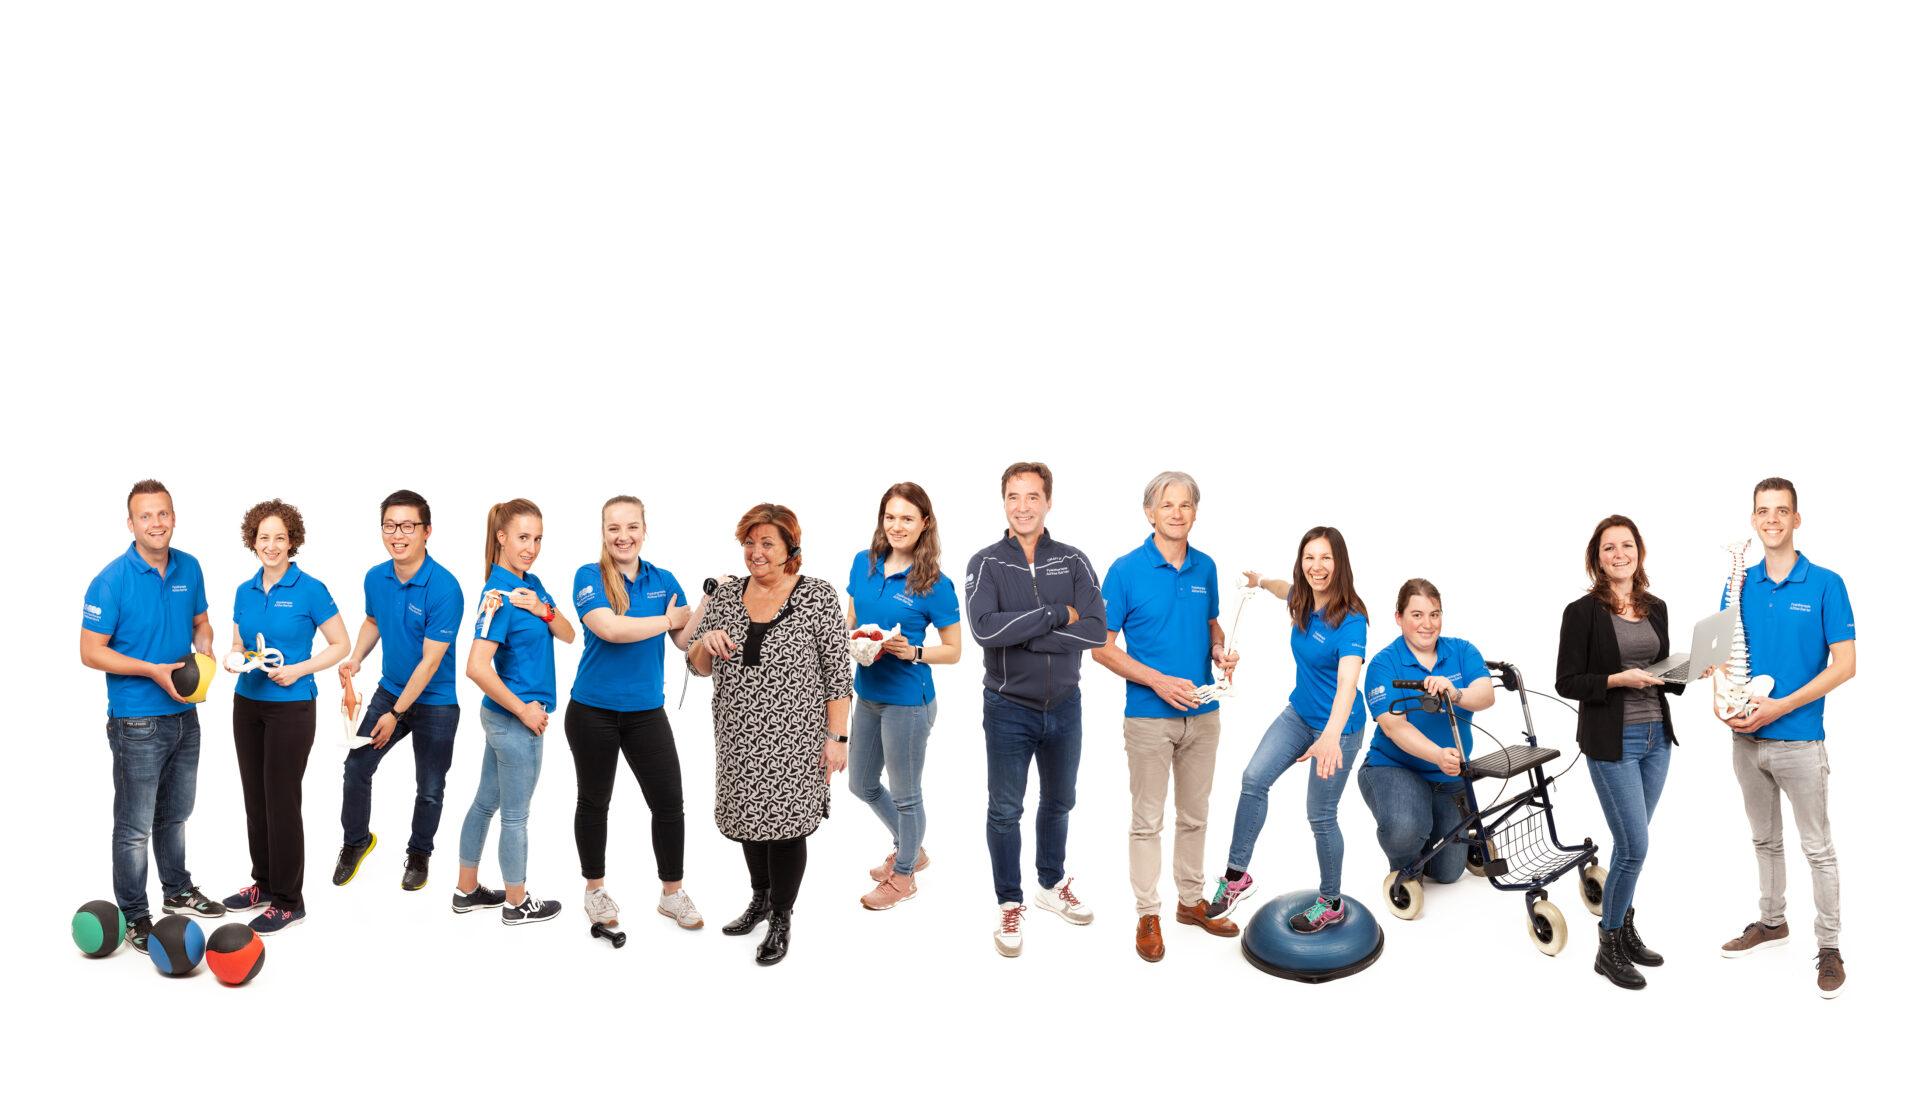 Samengestelde teamfoto Fysiotherapie